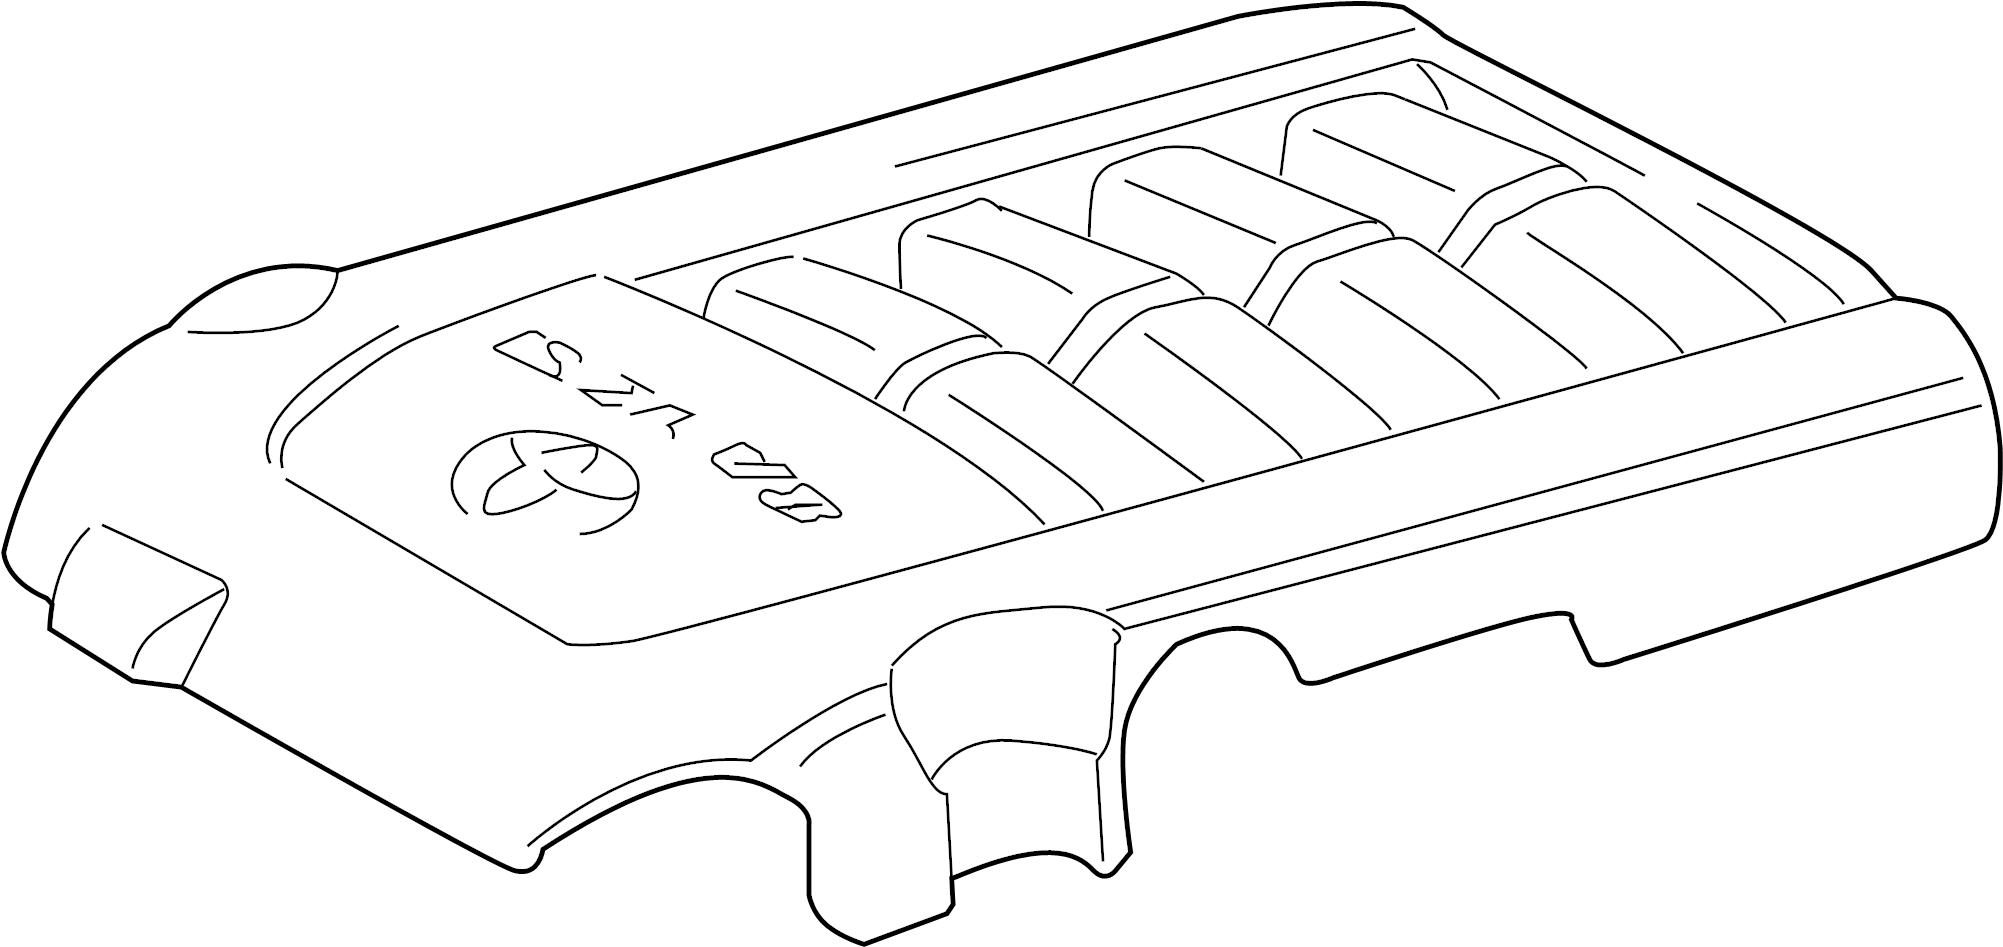 Toyota Tundra 4 7 Engine Diagram